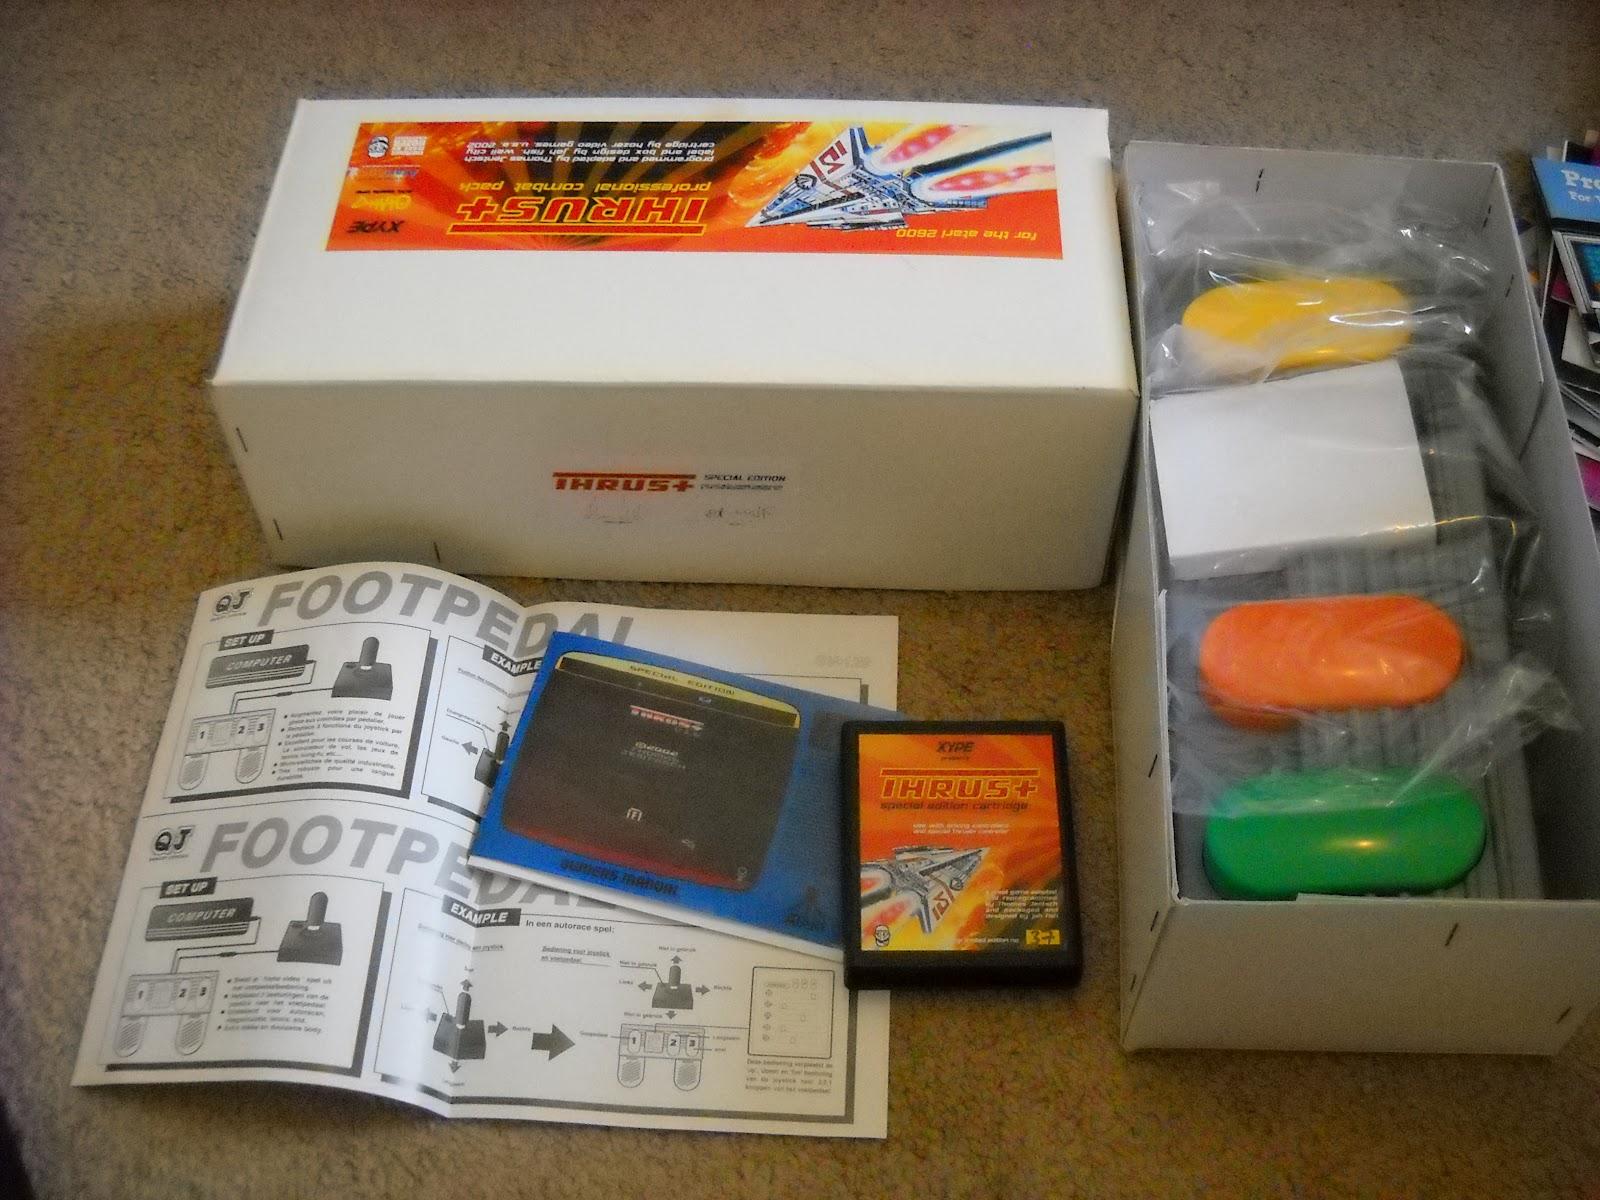 Atari+2600+Thrust+Plus+whole+package.JPG